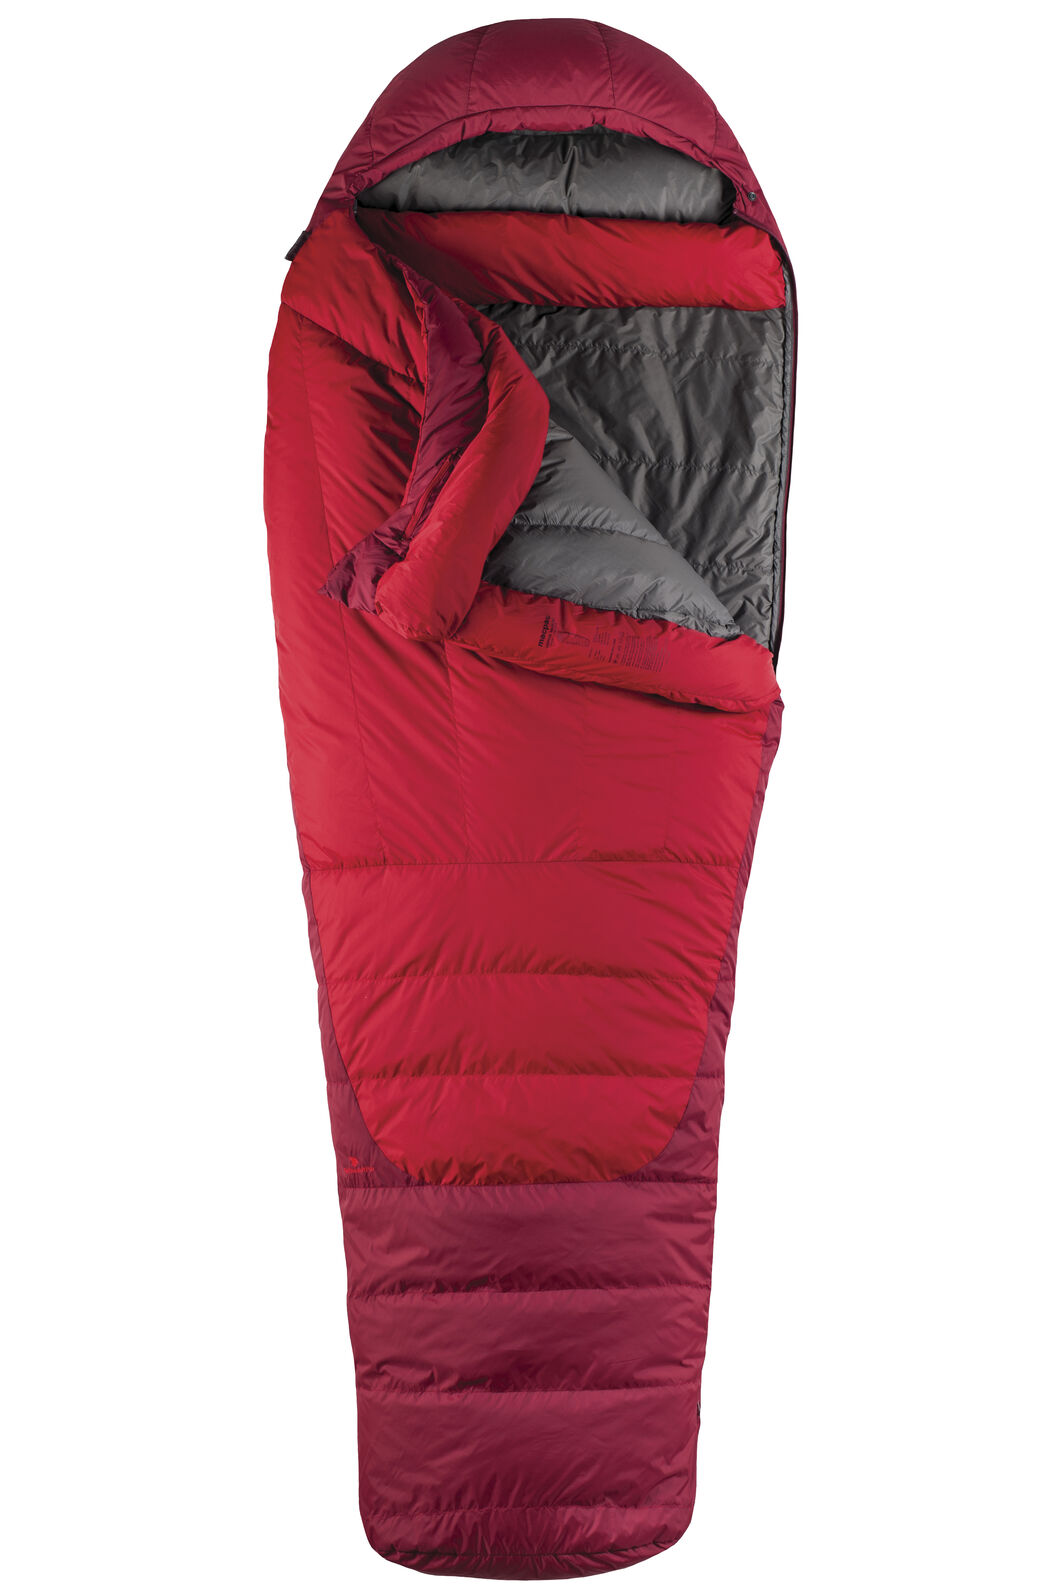 Latitude XP Goose Down 500 Sleeping Bag - Extra Large, Chilli, hi-res